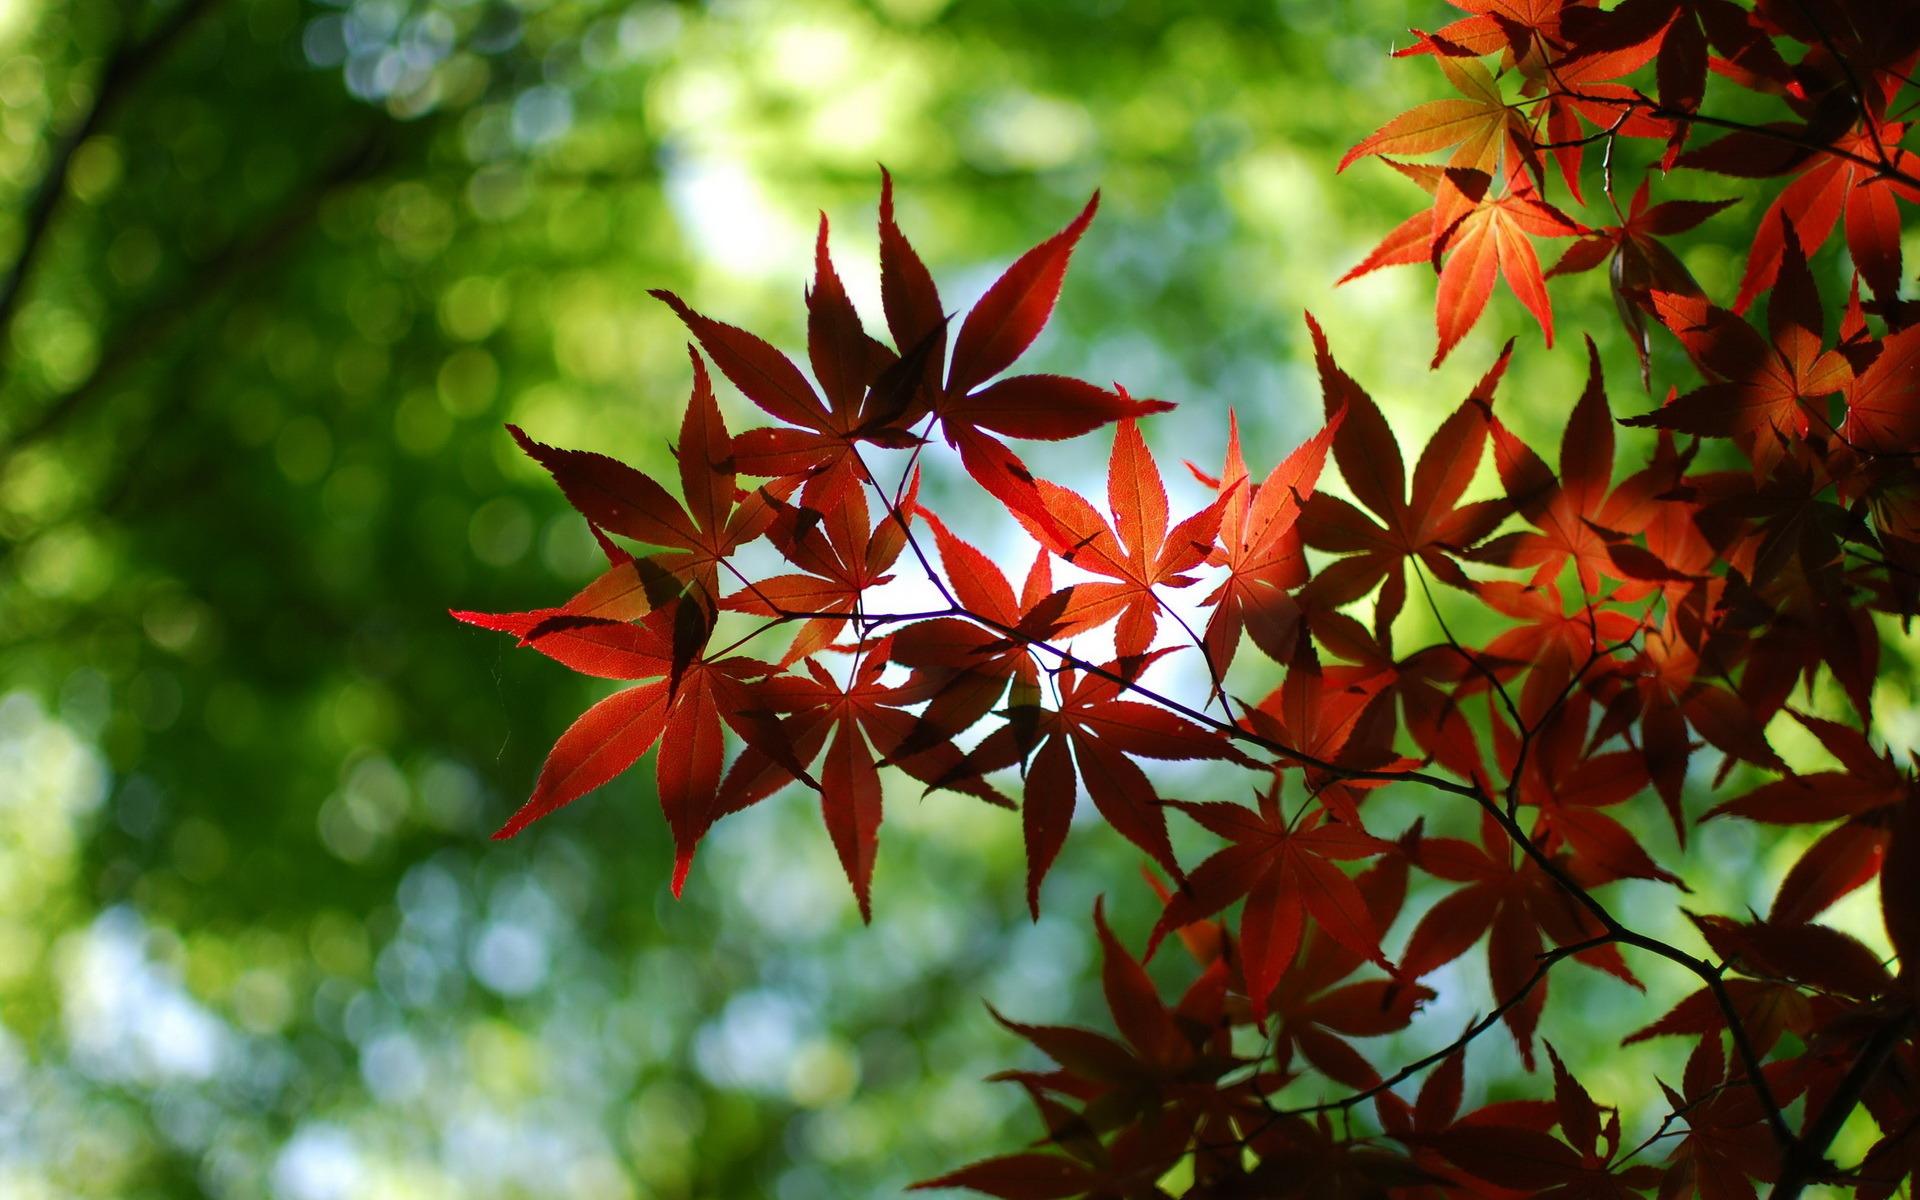 Leaves wallpaper 28194 1920x1200